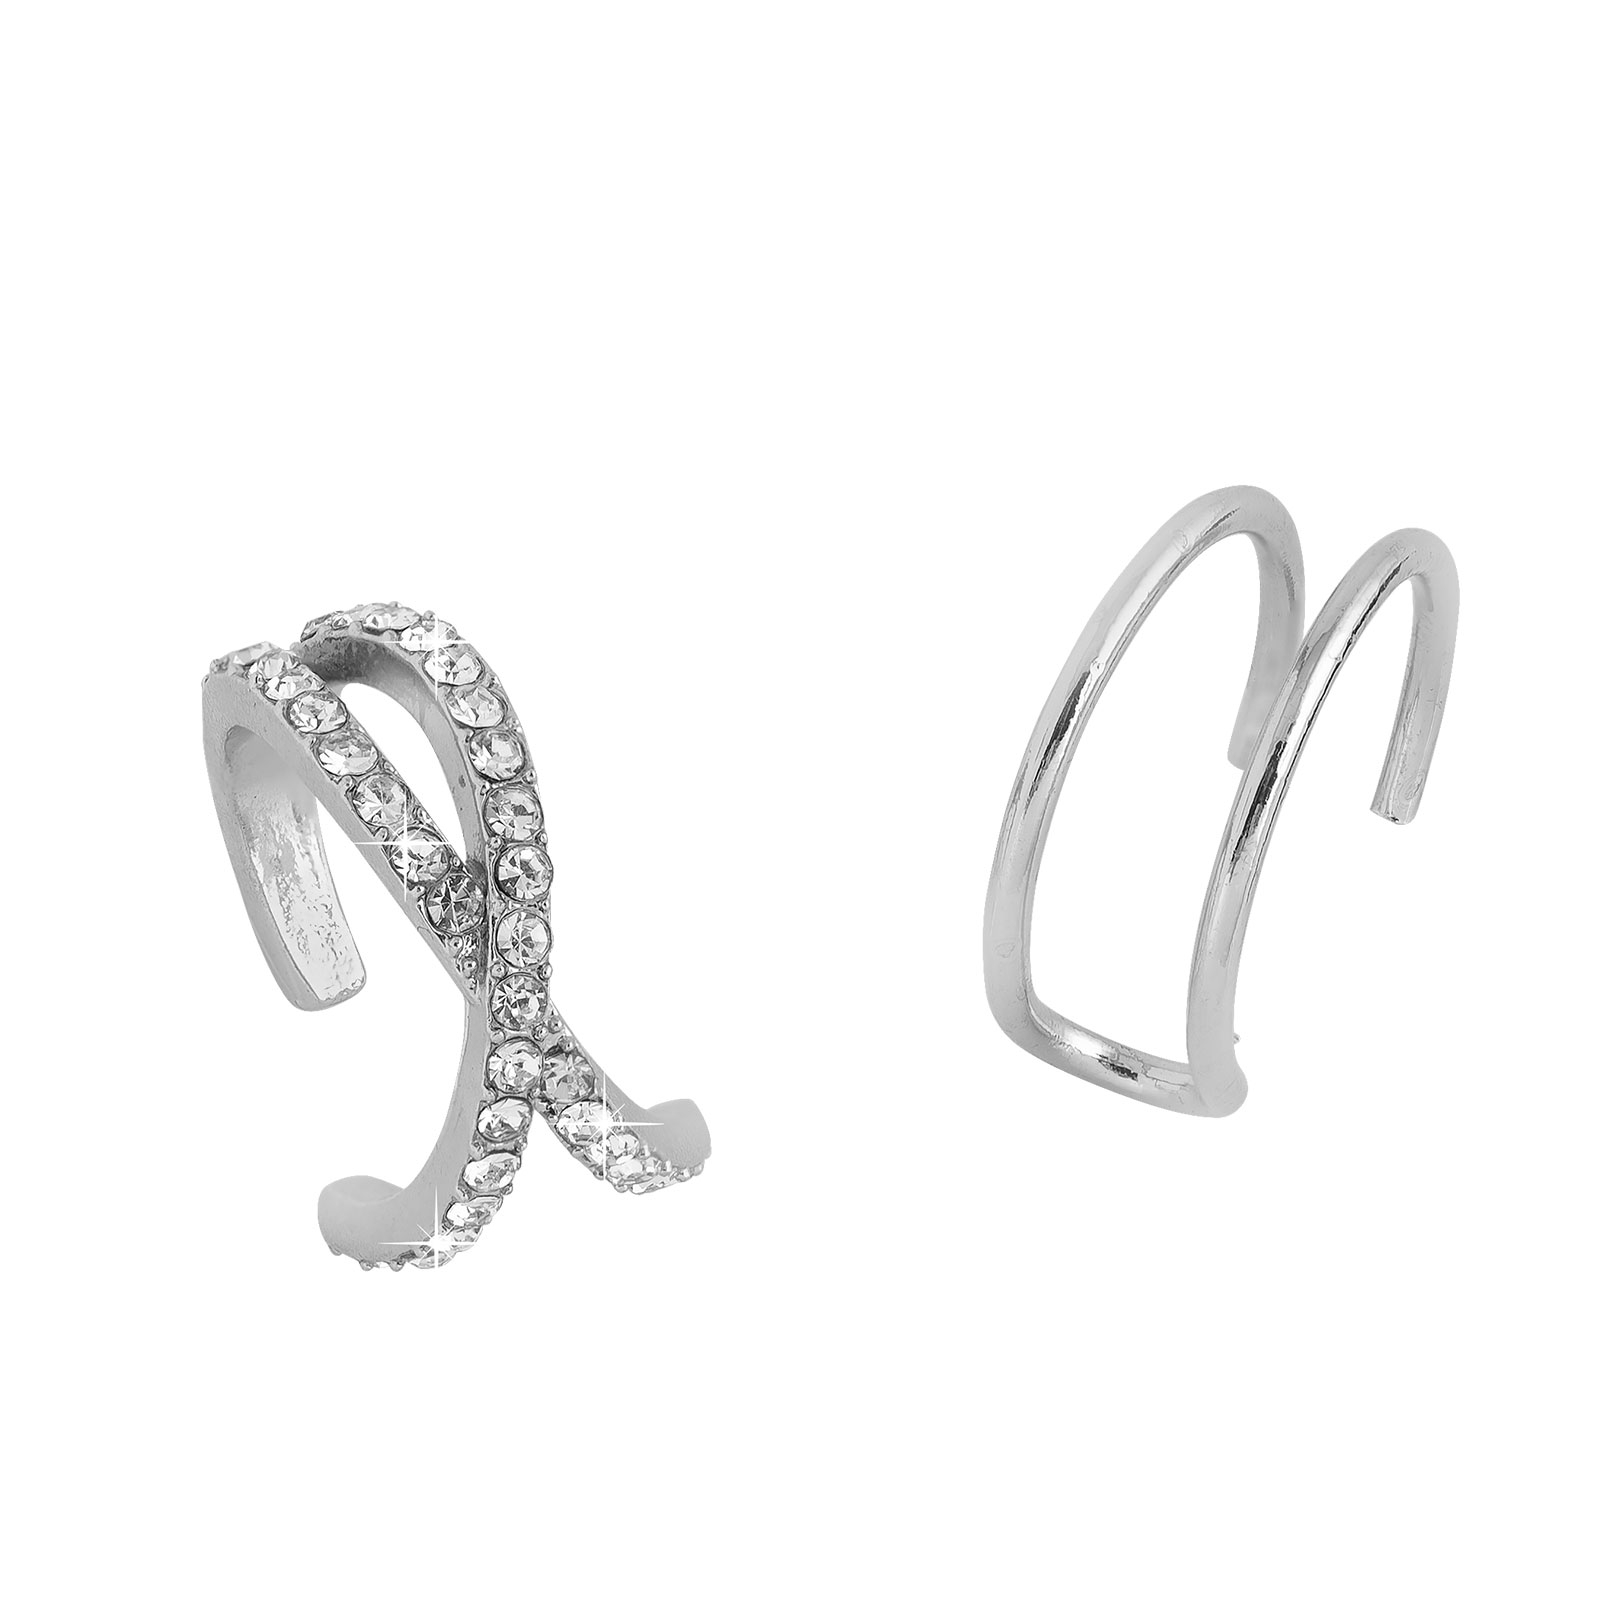 2-pack Ear cuffs silver Montini